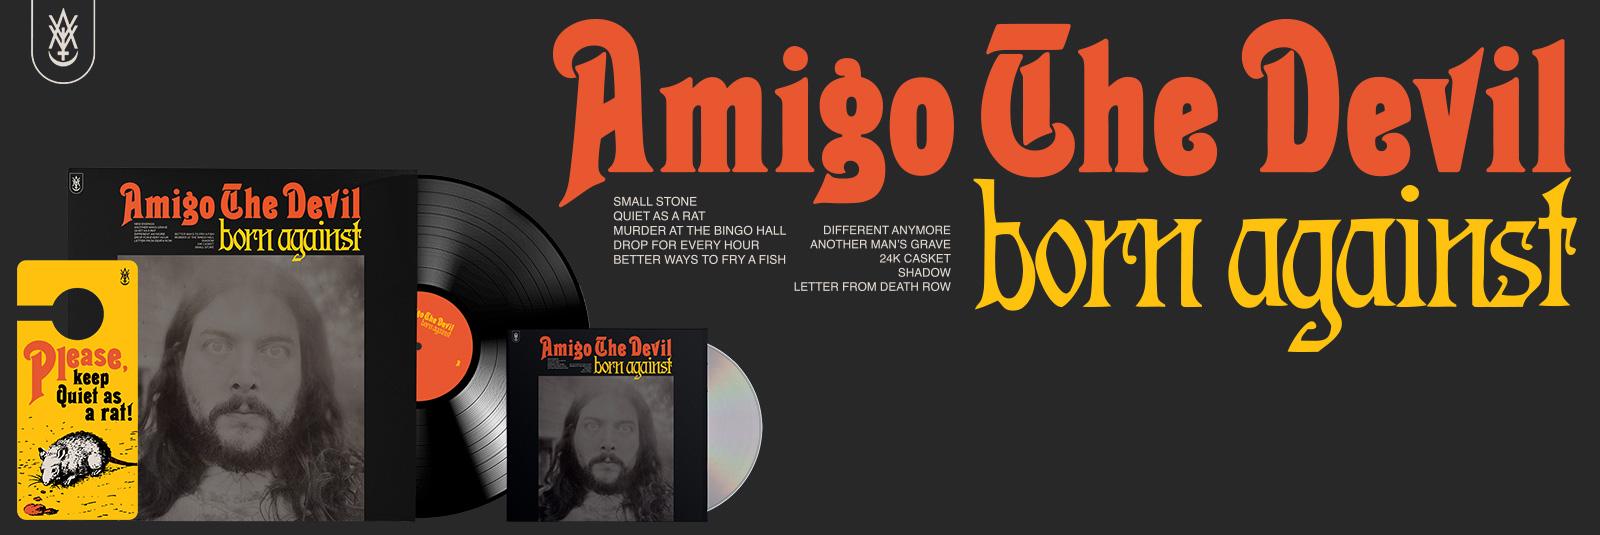 Amigo The Devil Born Against